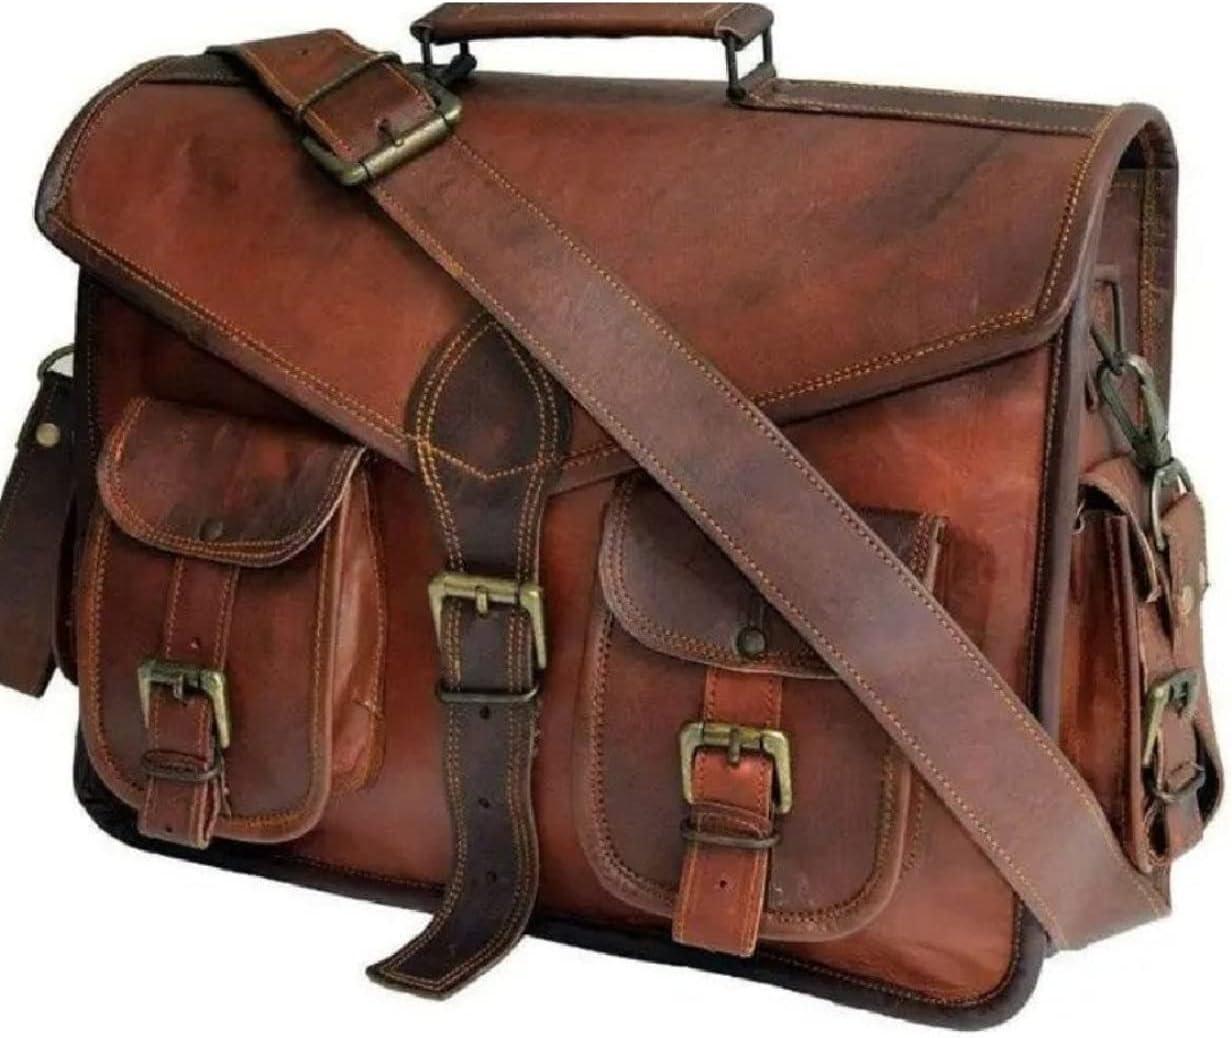 MONTEXOO 15 Inch Large Vintage La Bag Selling Selling rankings Handmade Messenger Leather